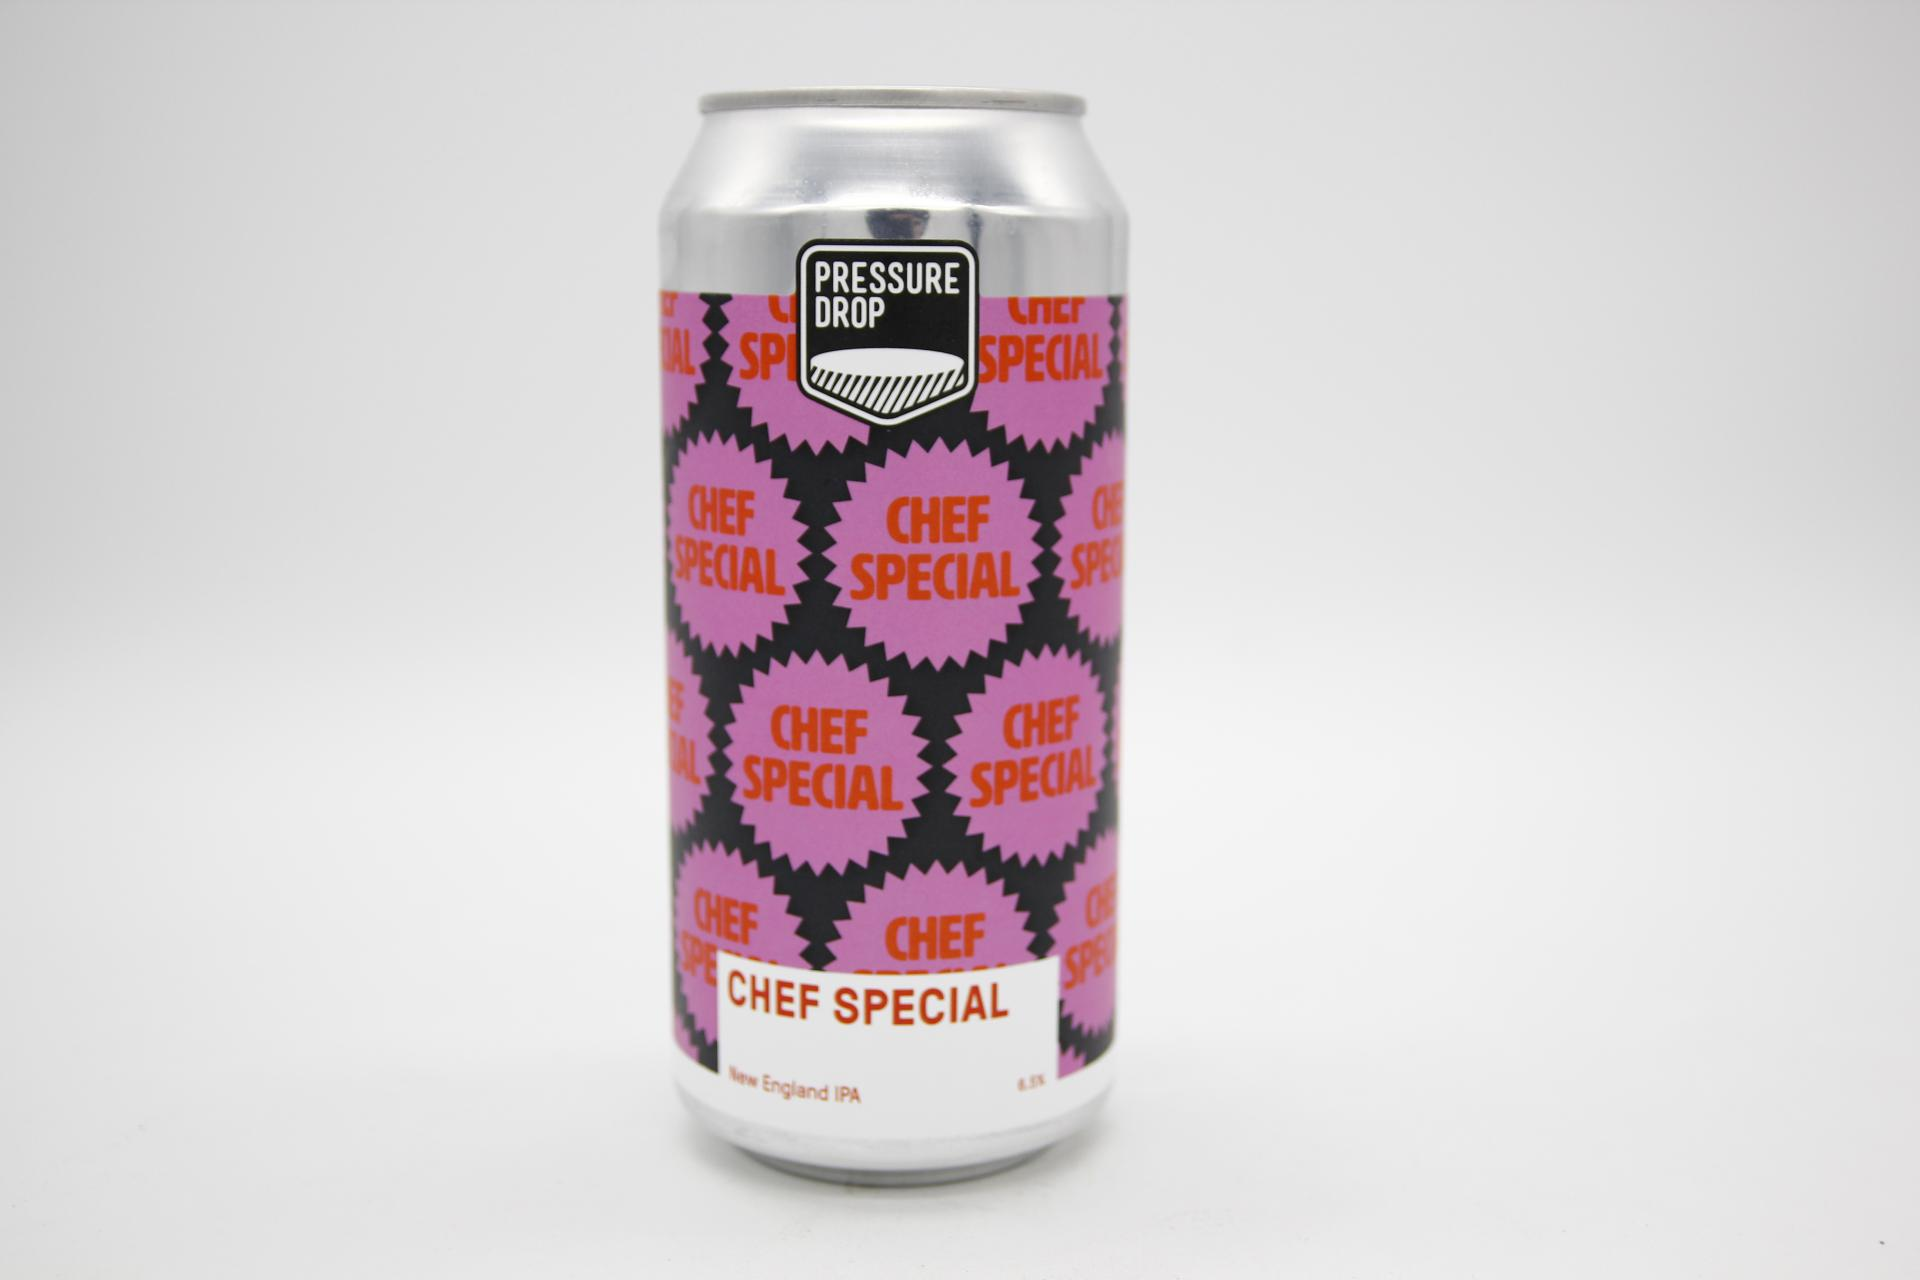 PRESSURE DROP - CHEF SPECIAL 44cl